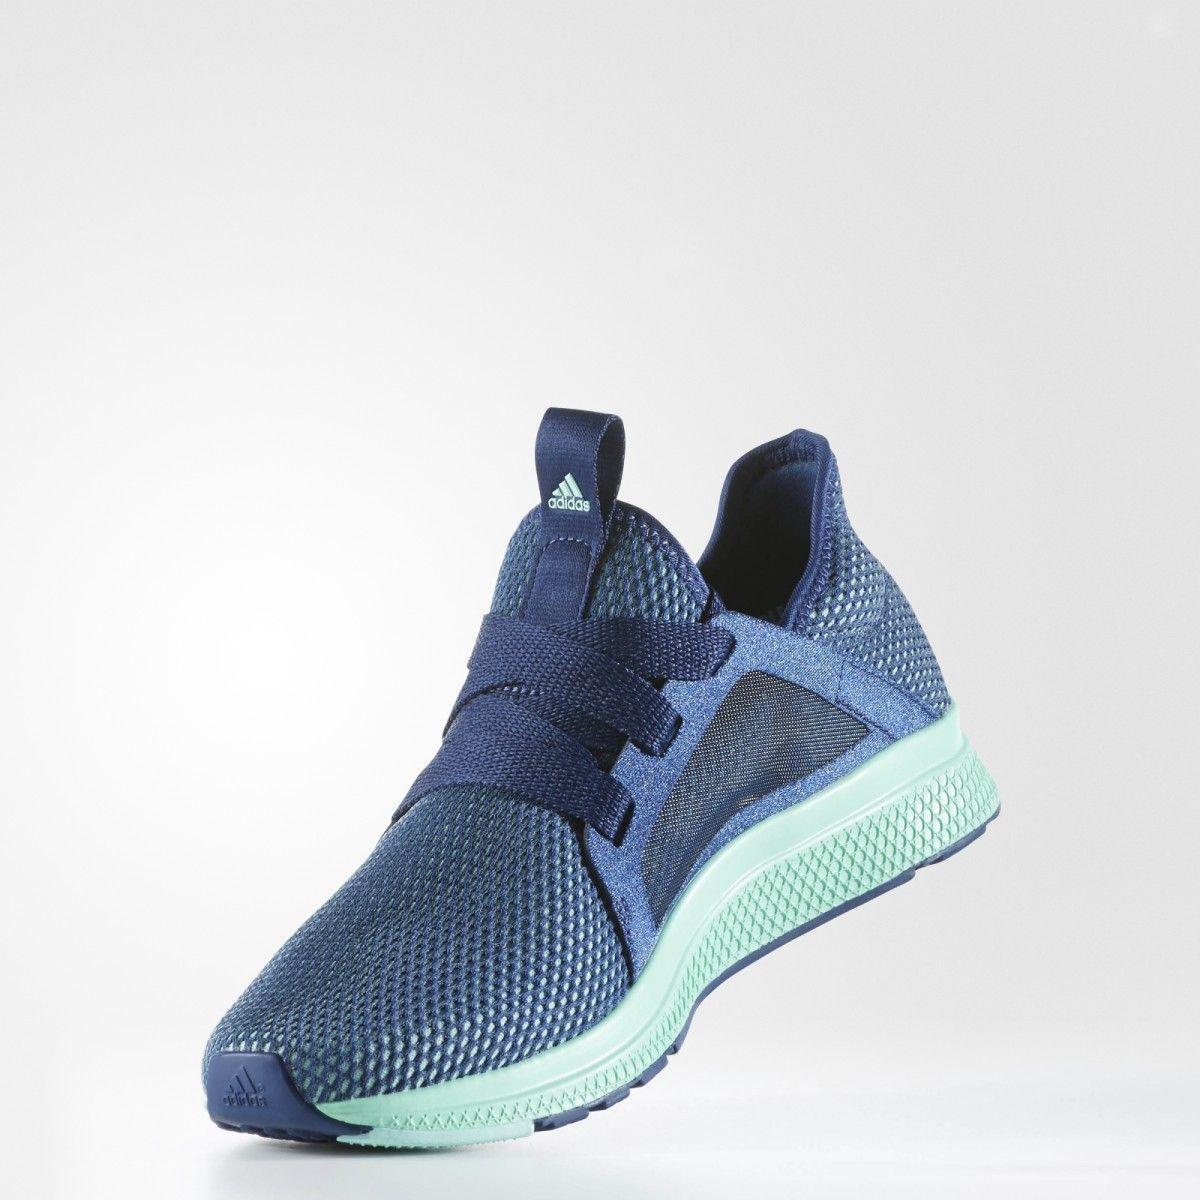 adidas edge luxe scarpe adidas indonesia ootd moda